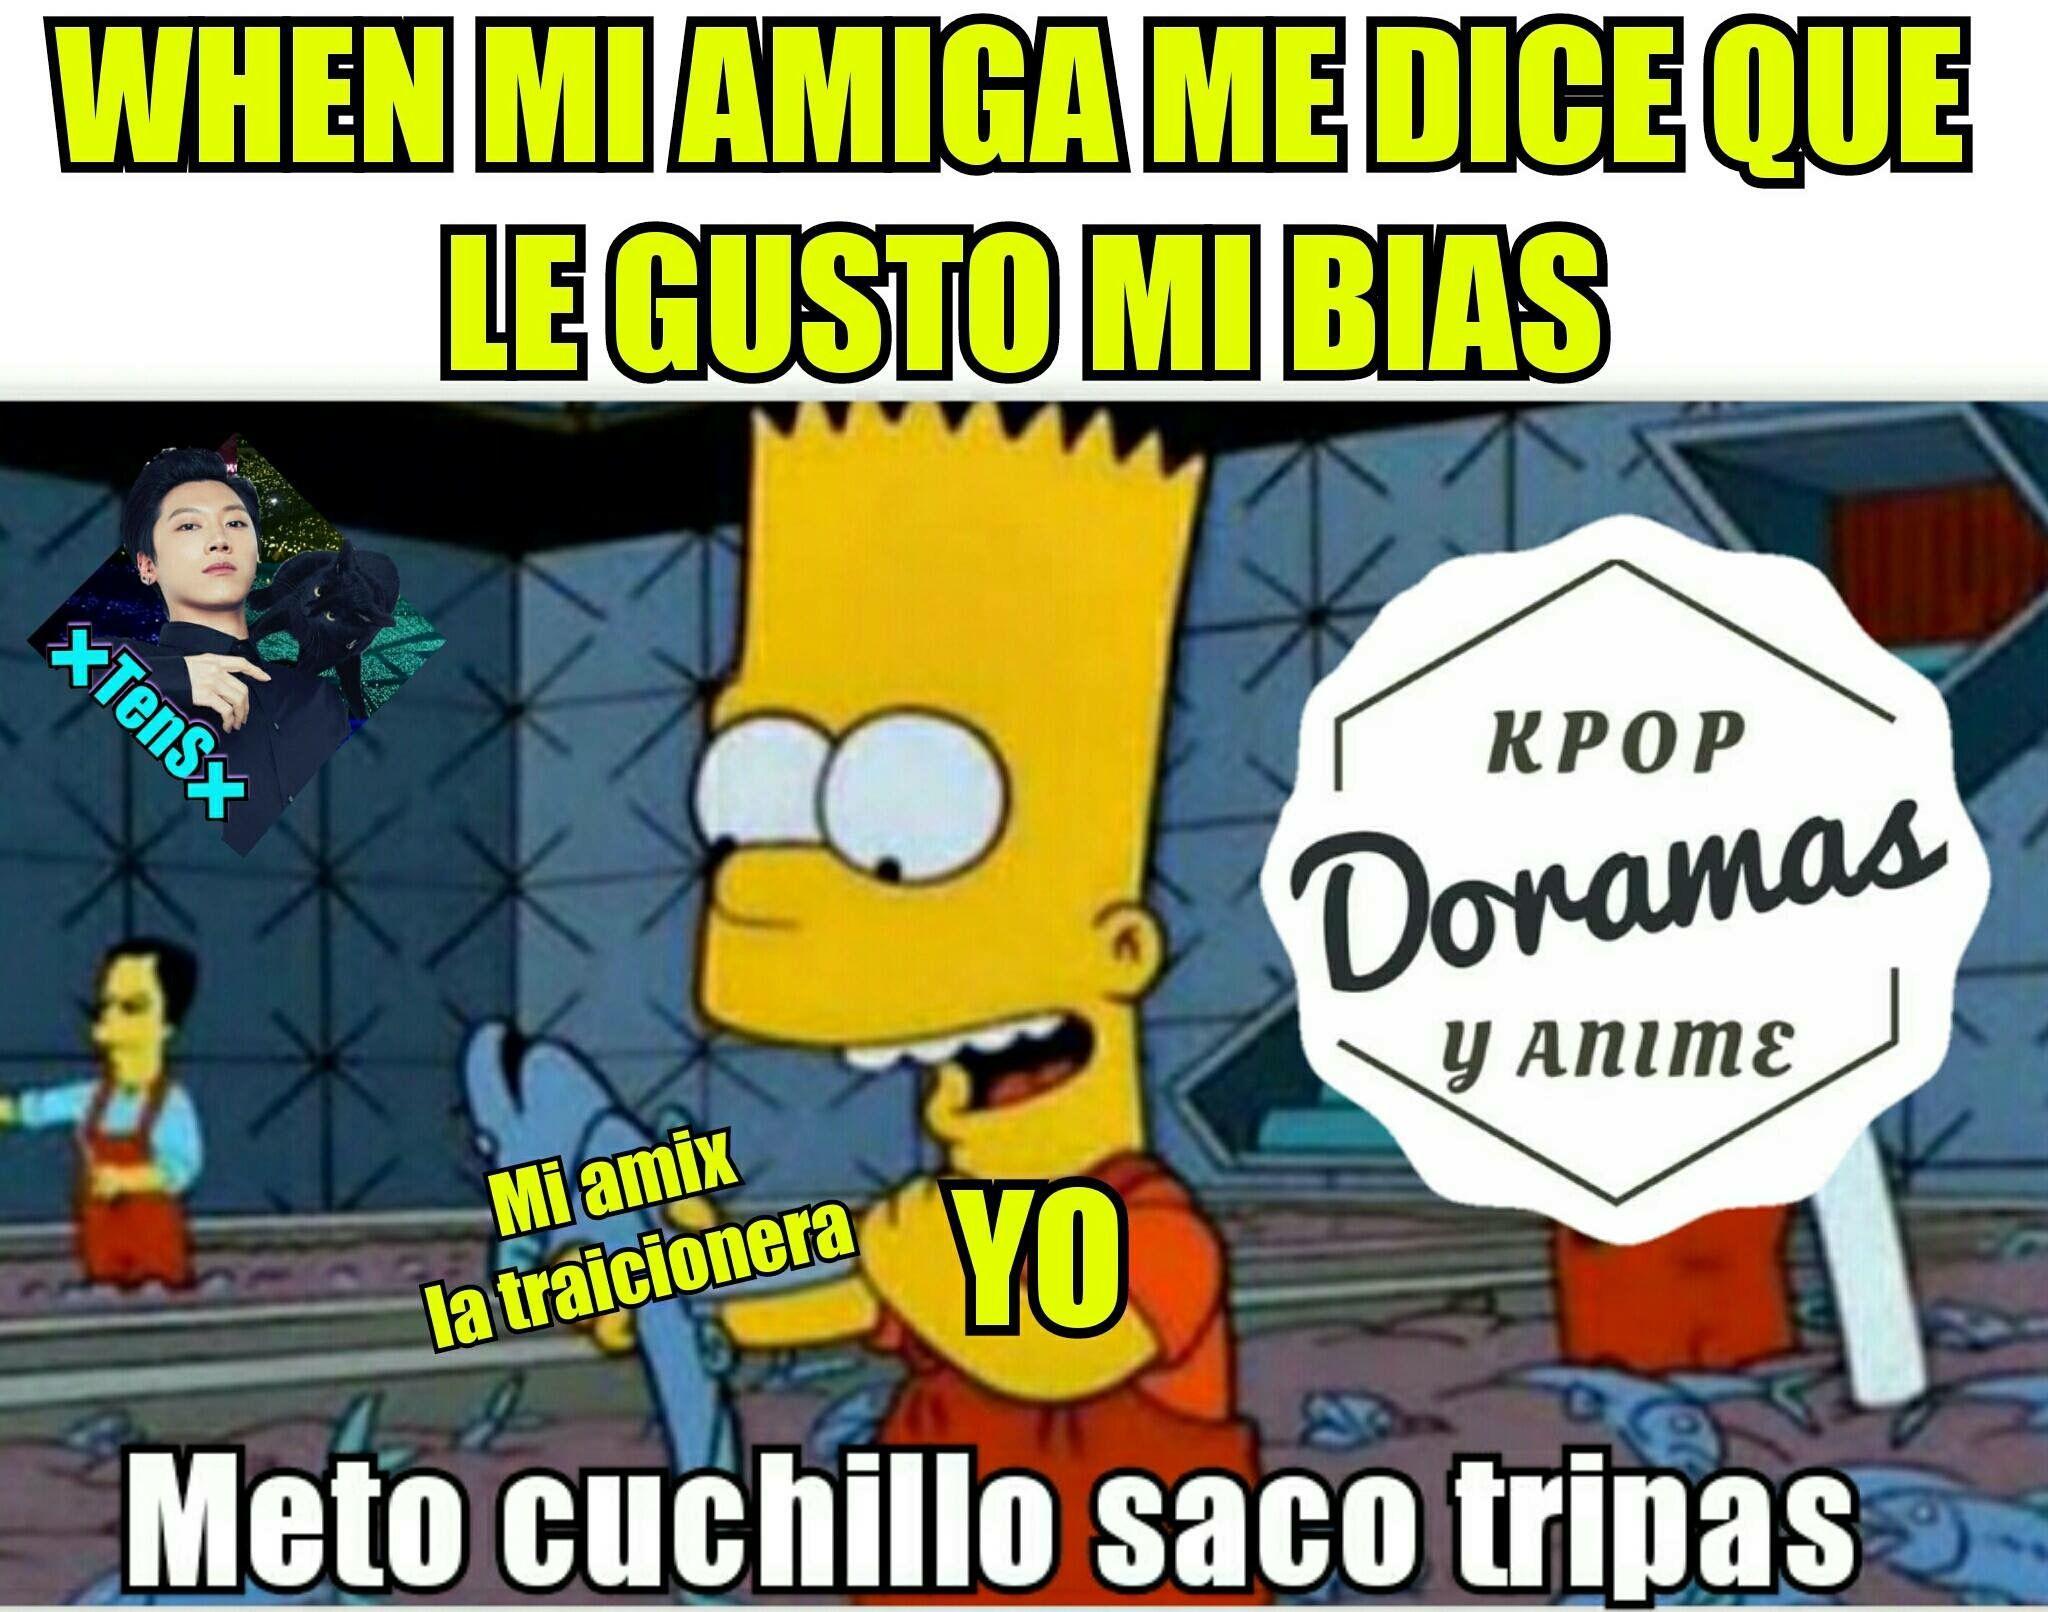 Pin De Taegi Vhope Sope Bts Bts Bts En ˏˋ M E M E S ˎˊ Memes Memes Divertidos Bts Memes